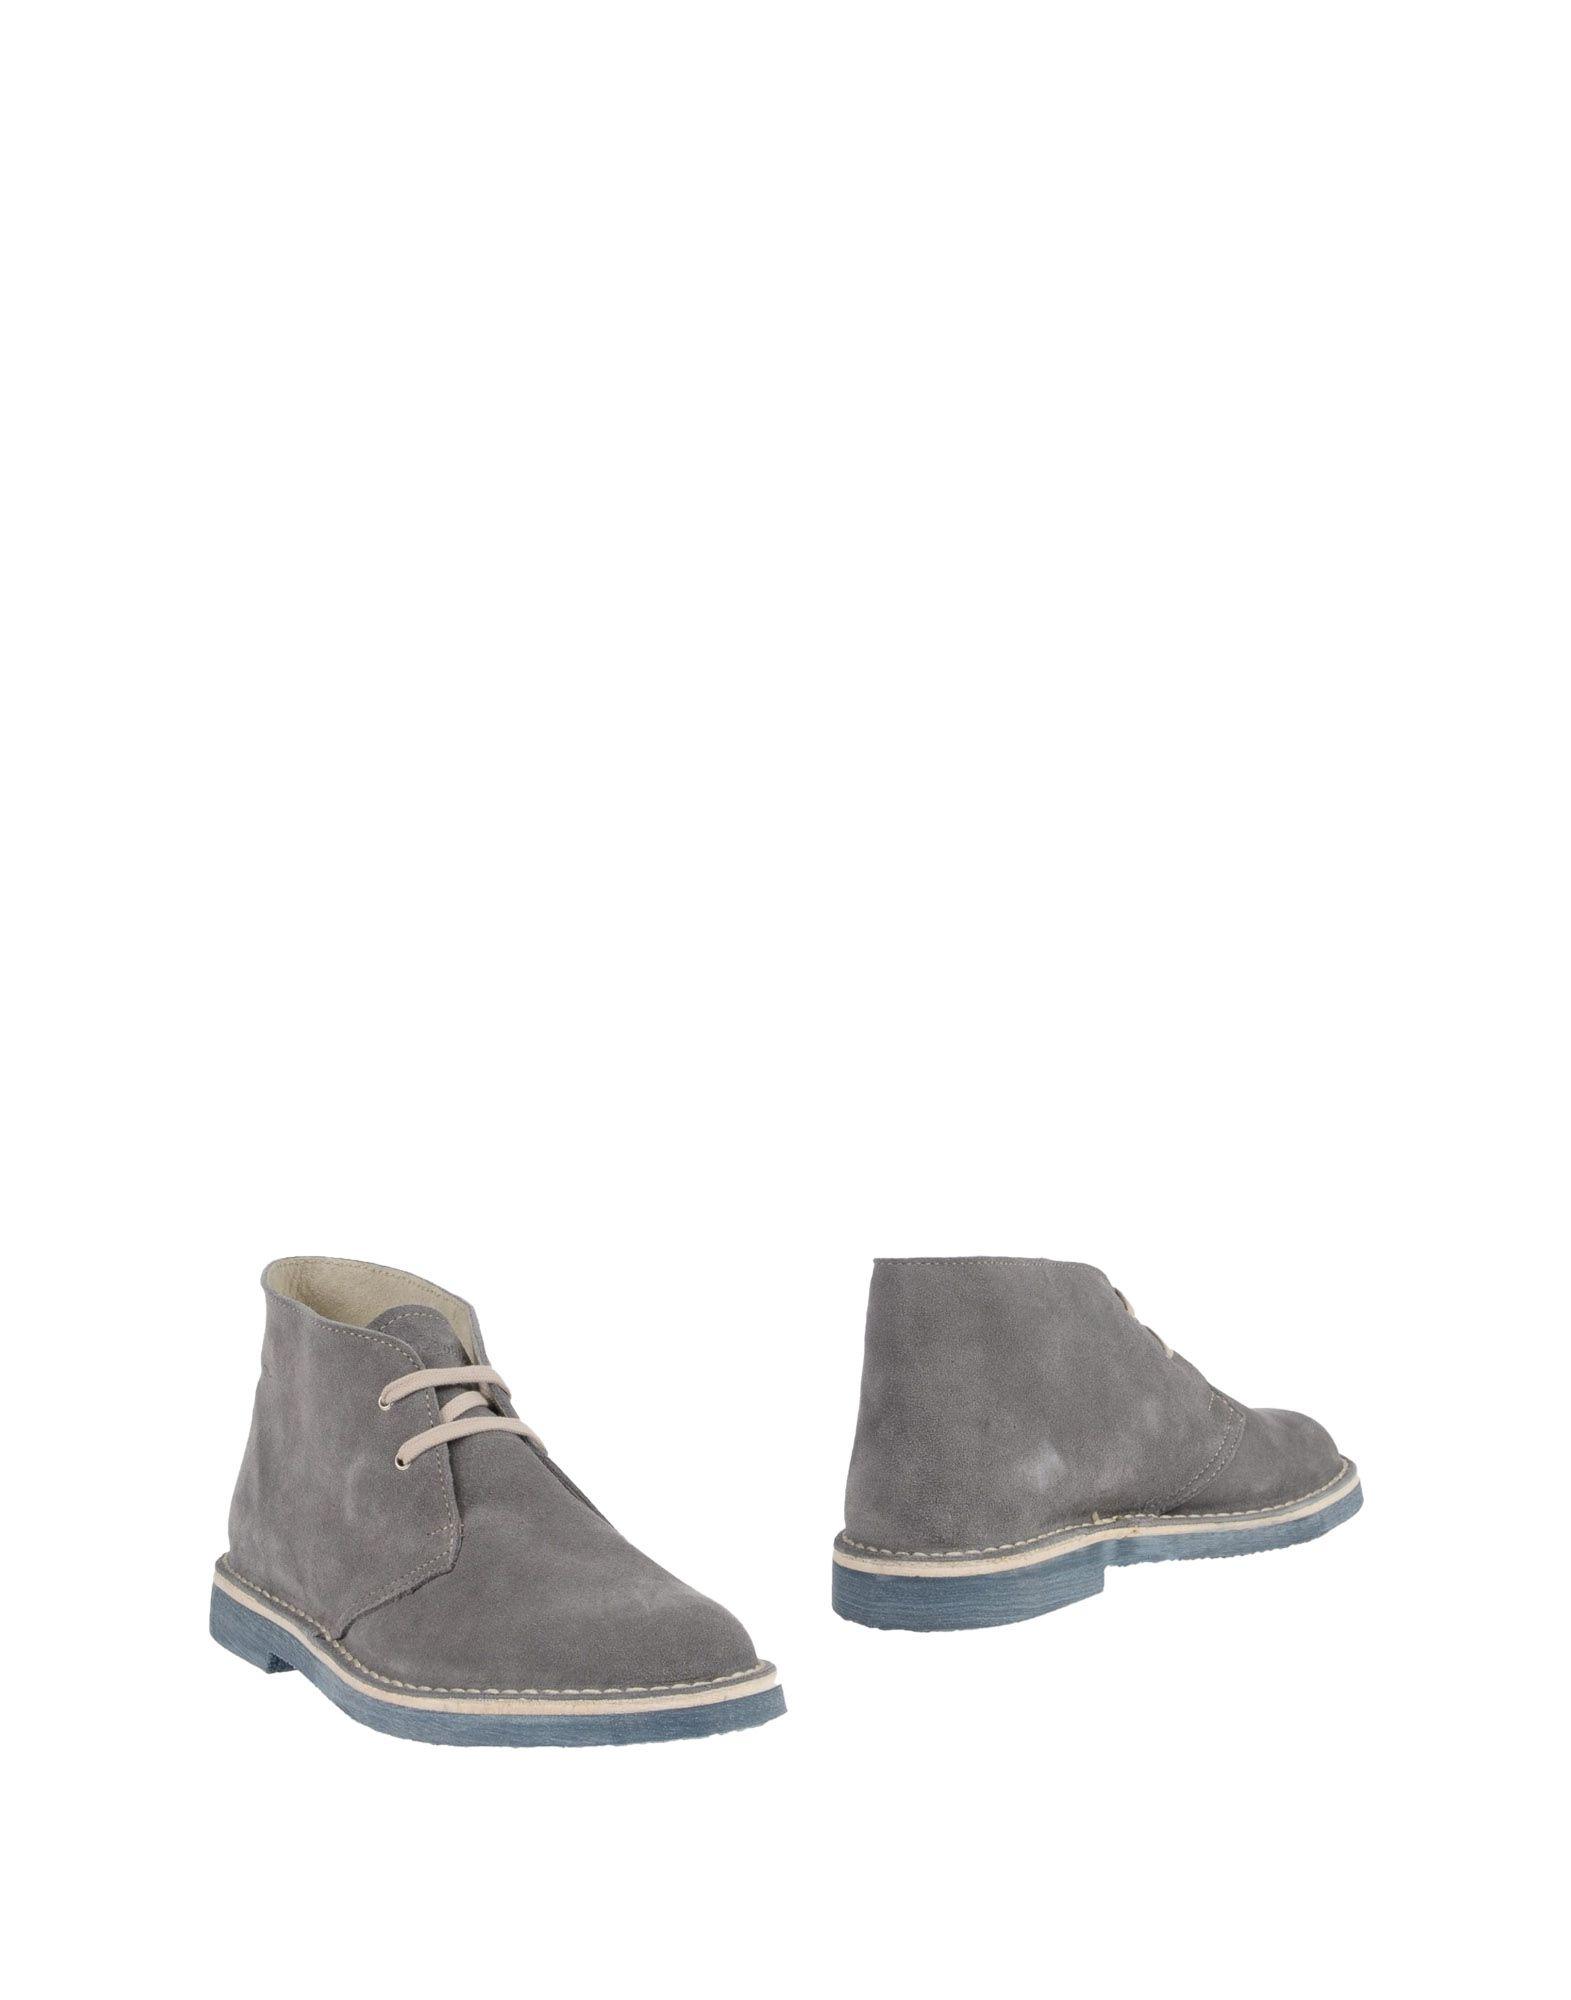 Doubles 4 You® Stiefelette Herren  11424173ED Neue Schuhe